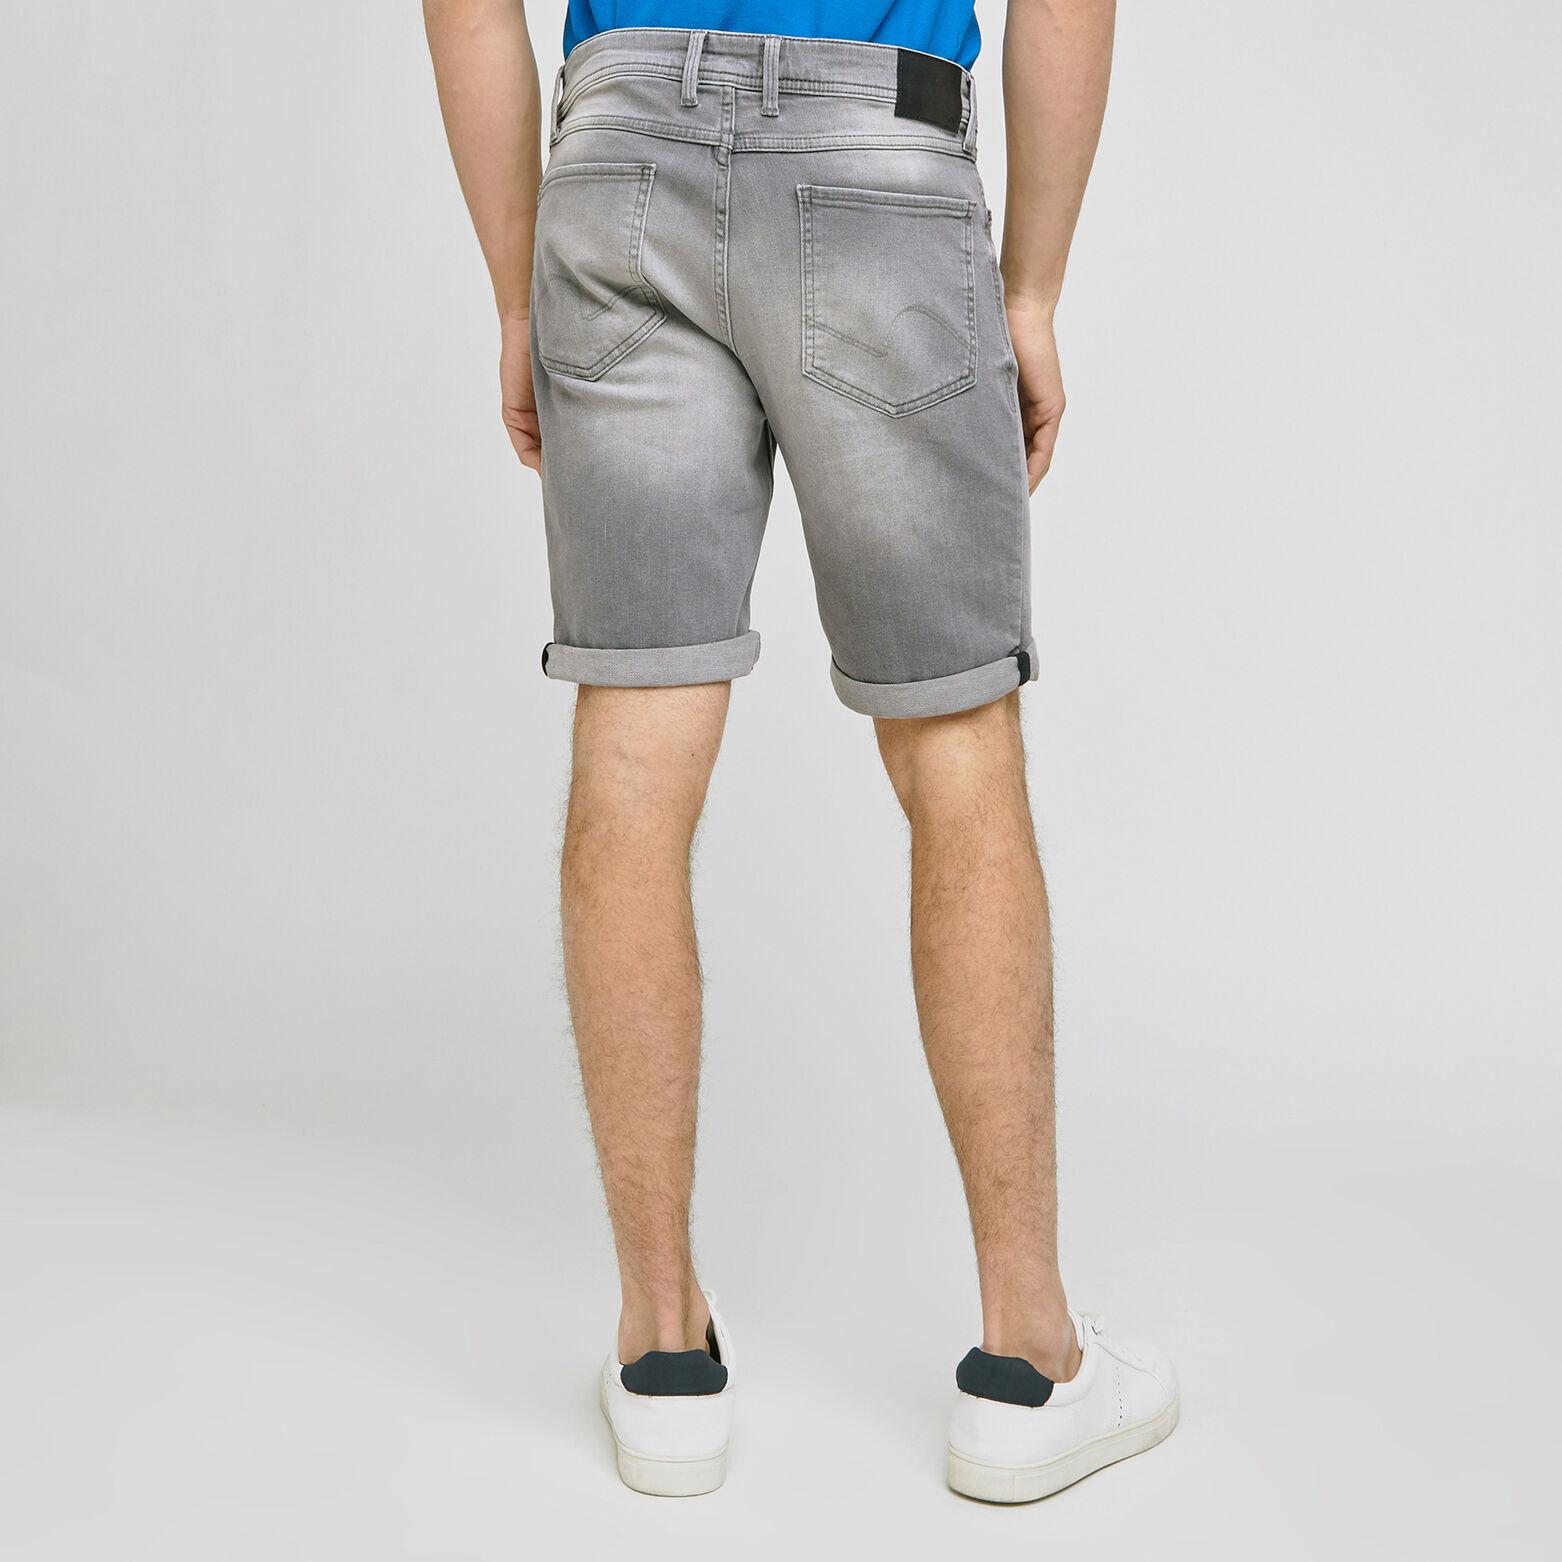 Bermuda 5 poches denim gris